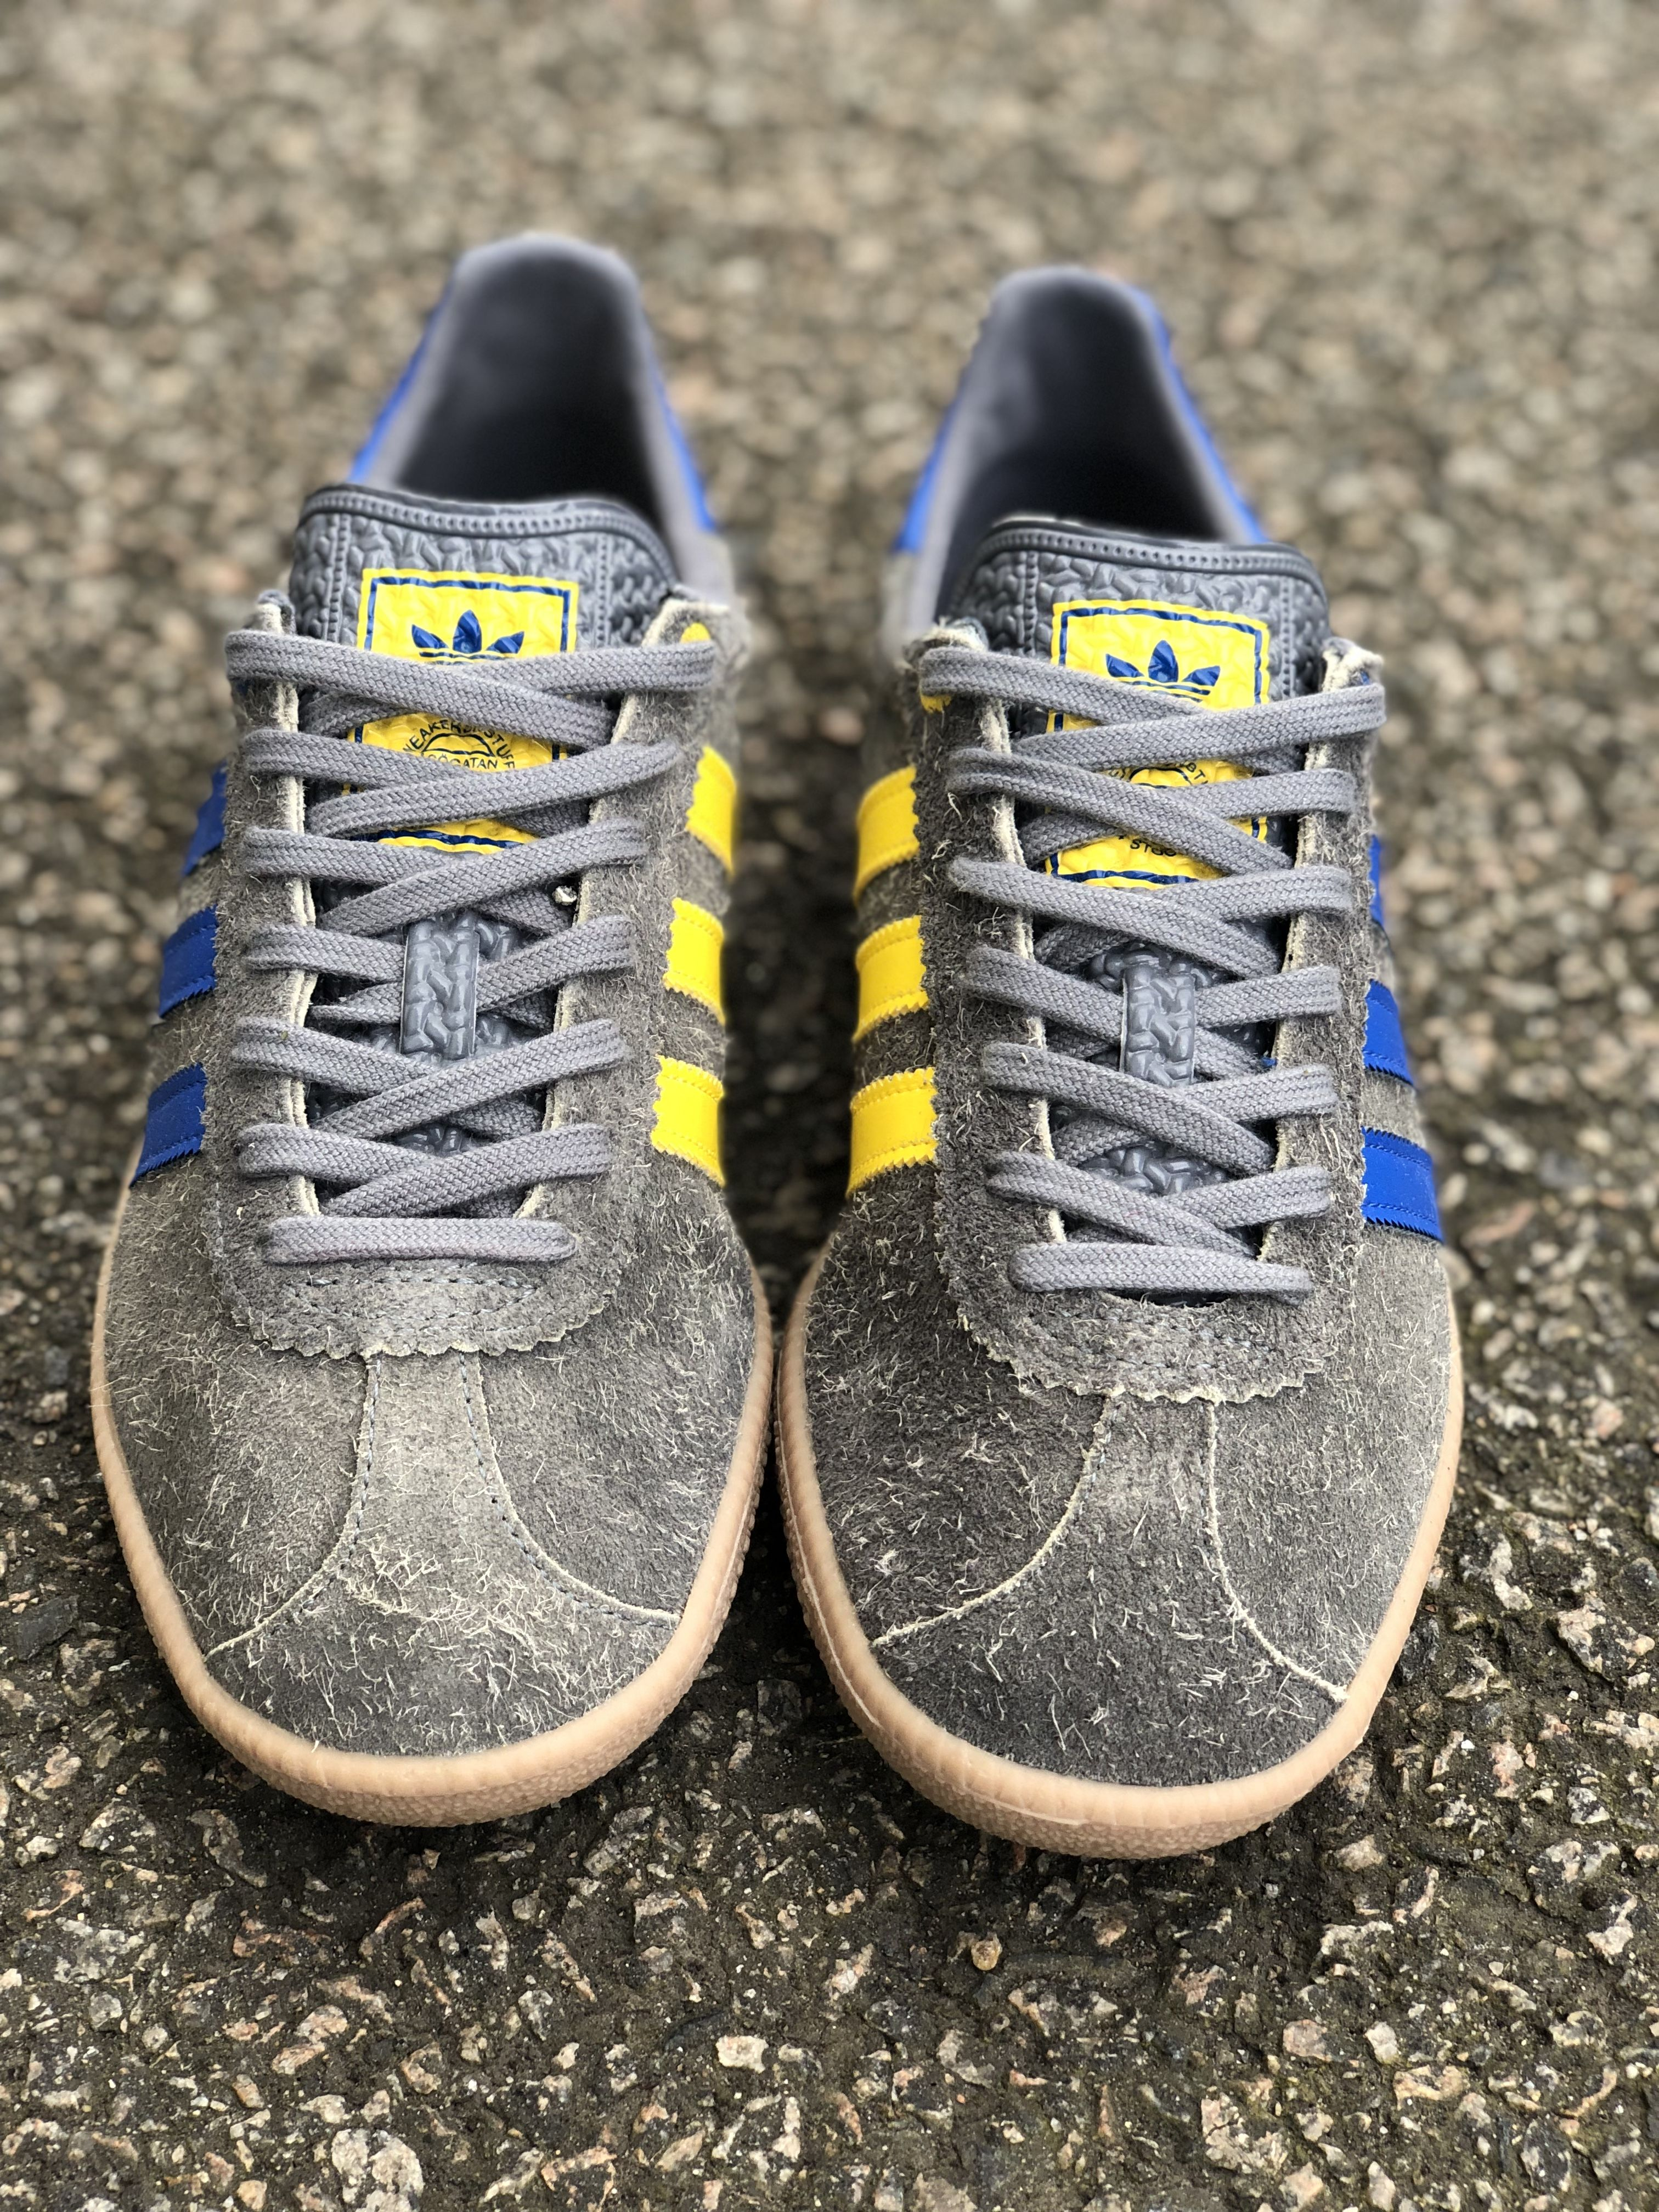 Adidas Stockholm in Herren Turnschuhe & Sneaker günstig